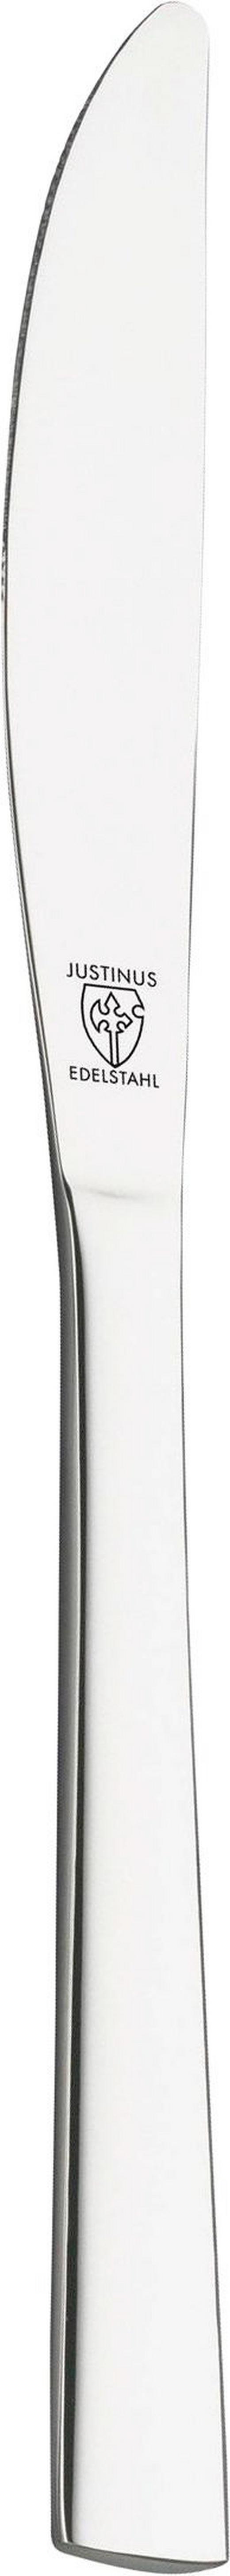 NOŽ - boje srebra, Konvencionalno, metal (22.6/0.19/0.07cm) - JUSTINUS